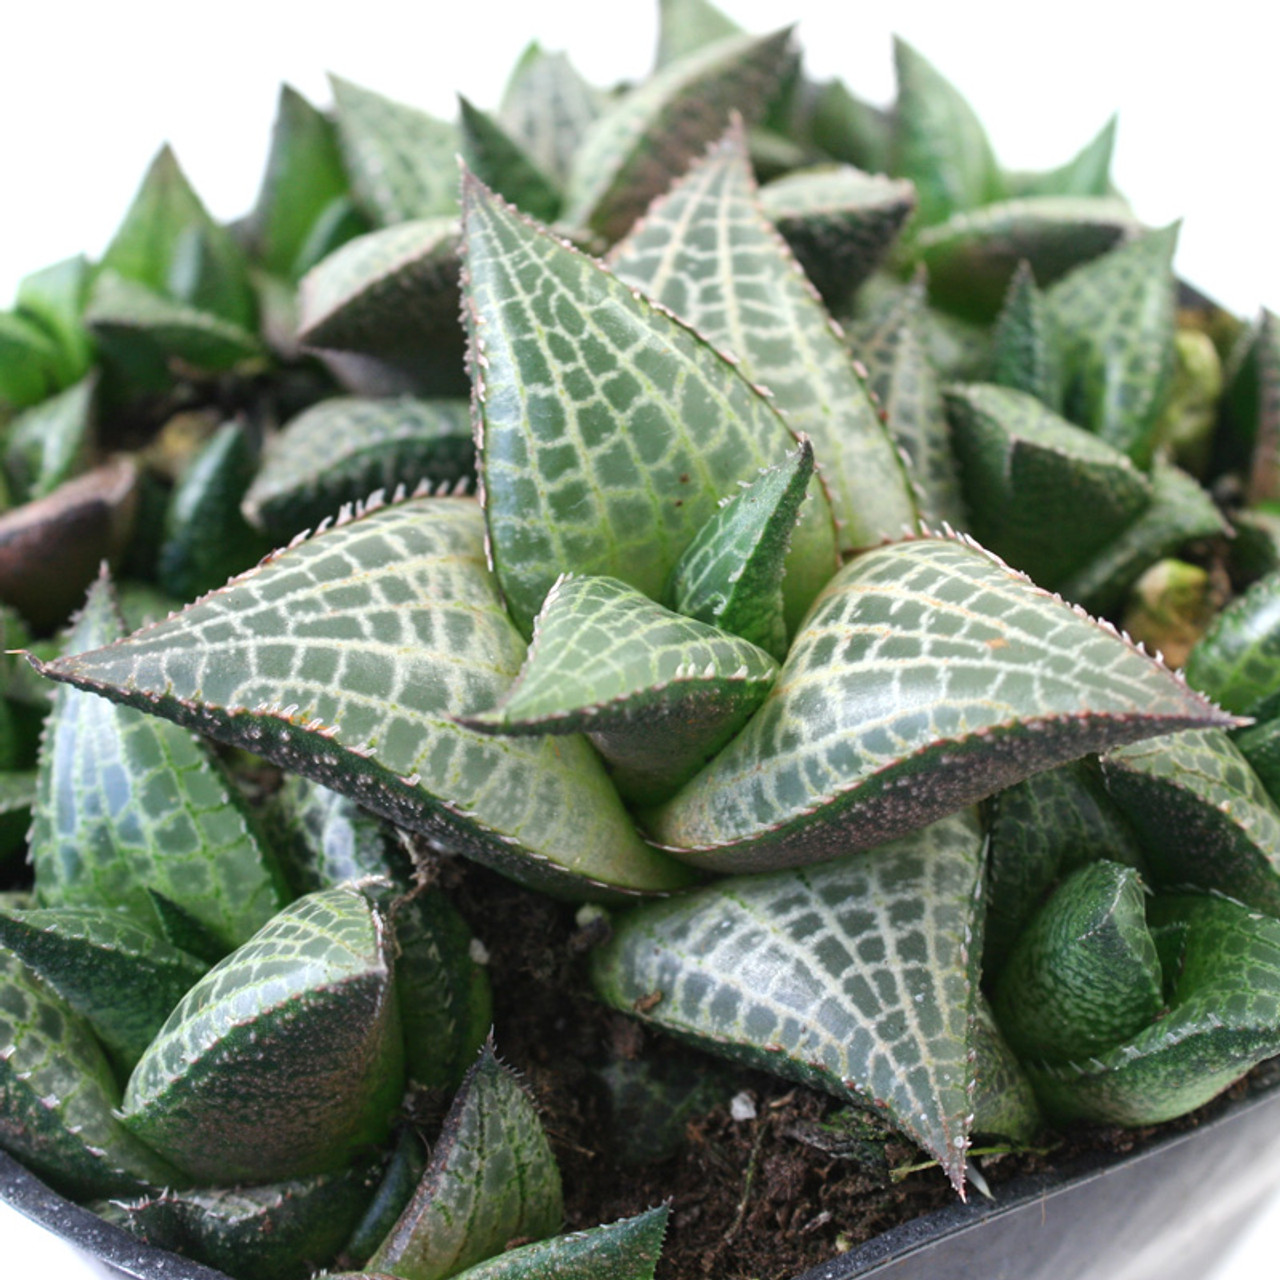 Veined Haworthia Tessellata Succulents For Sale